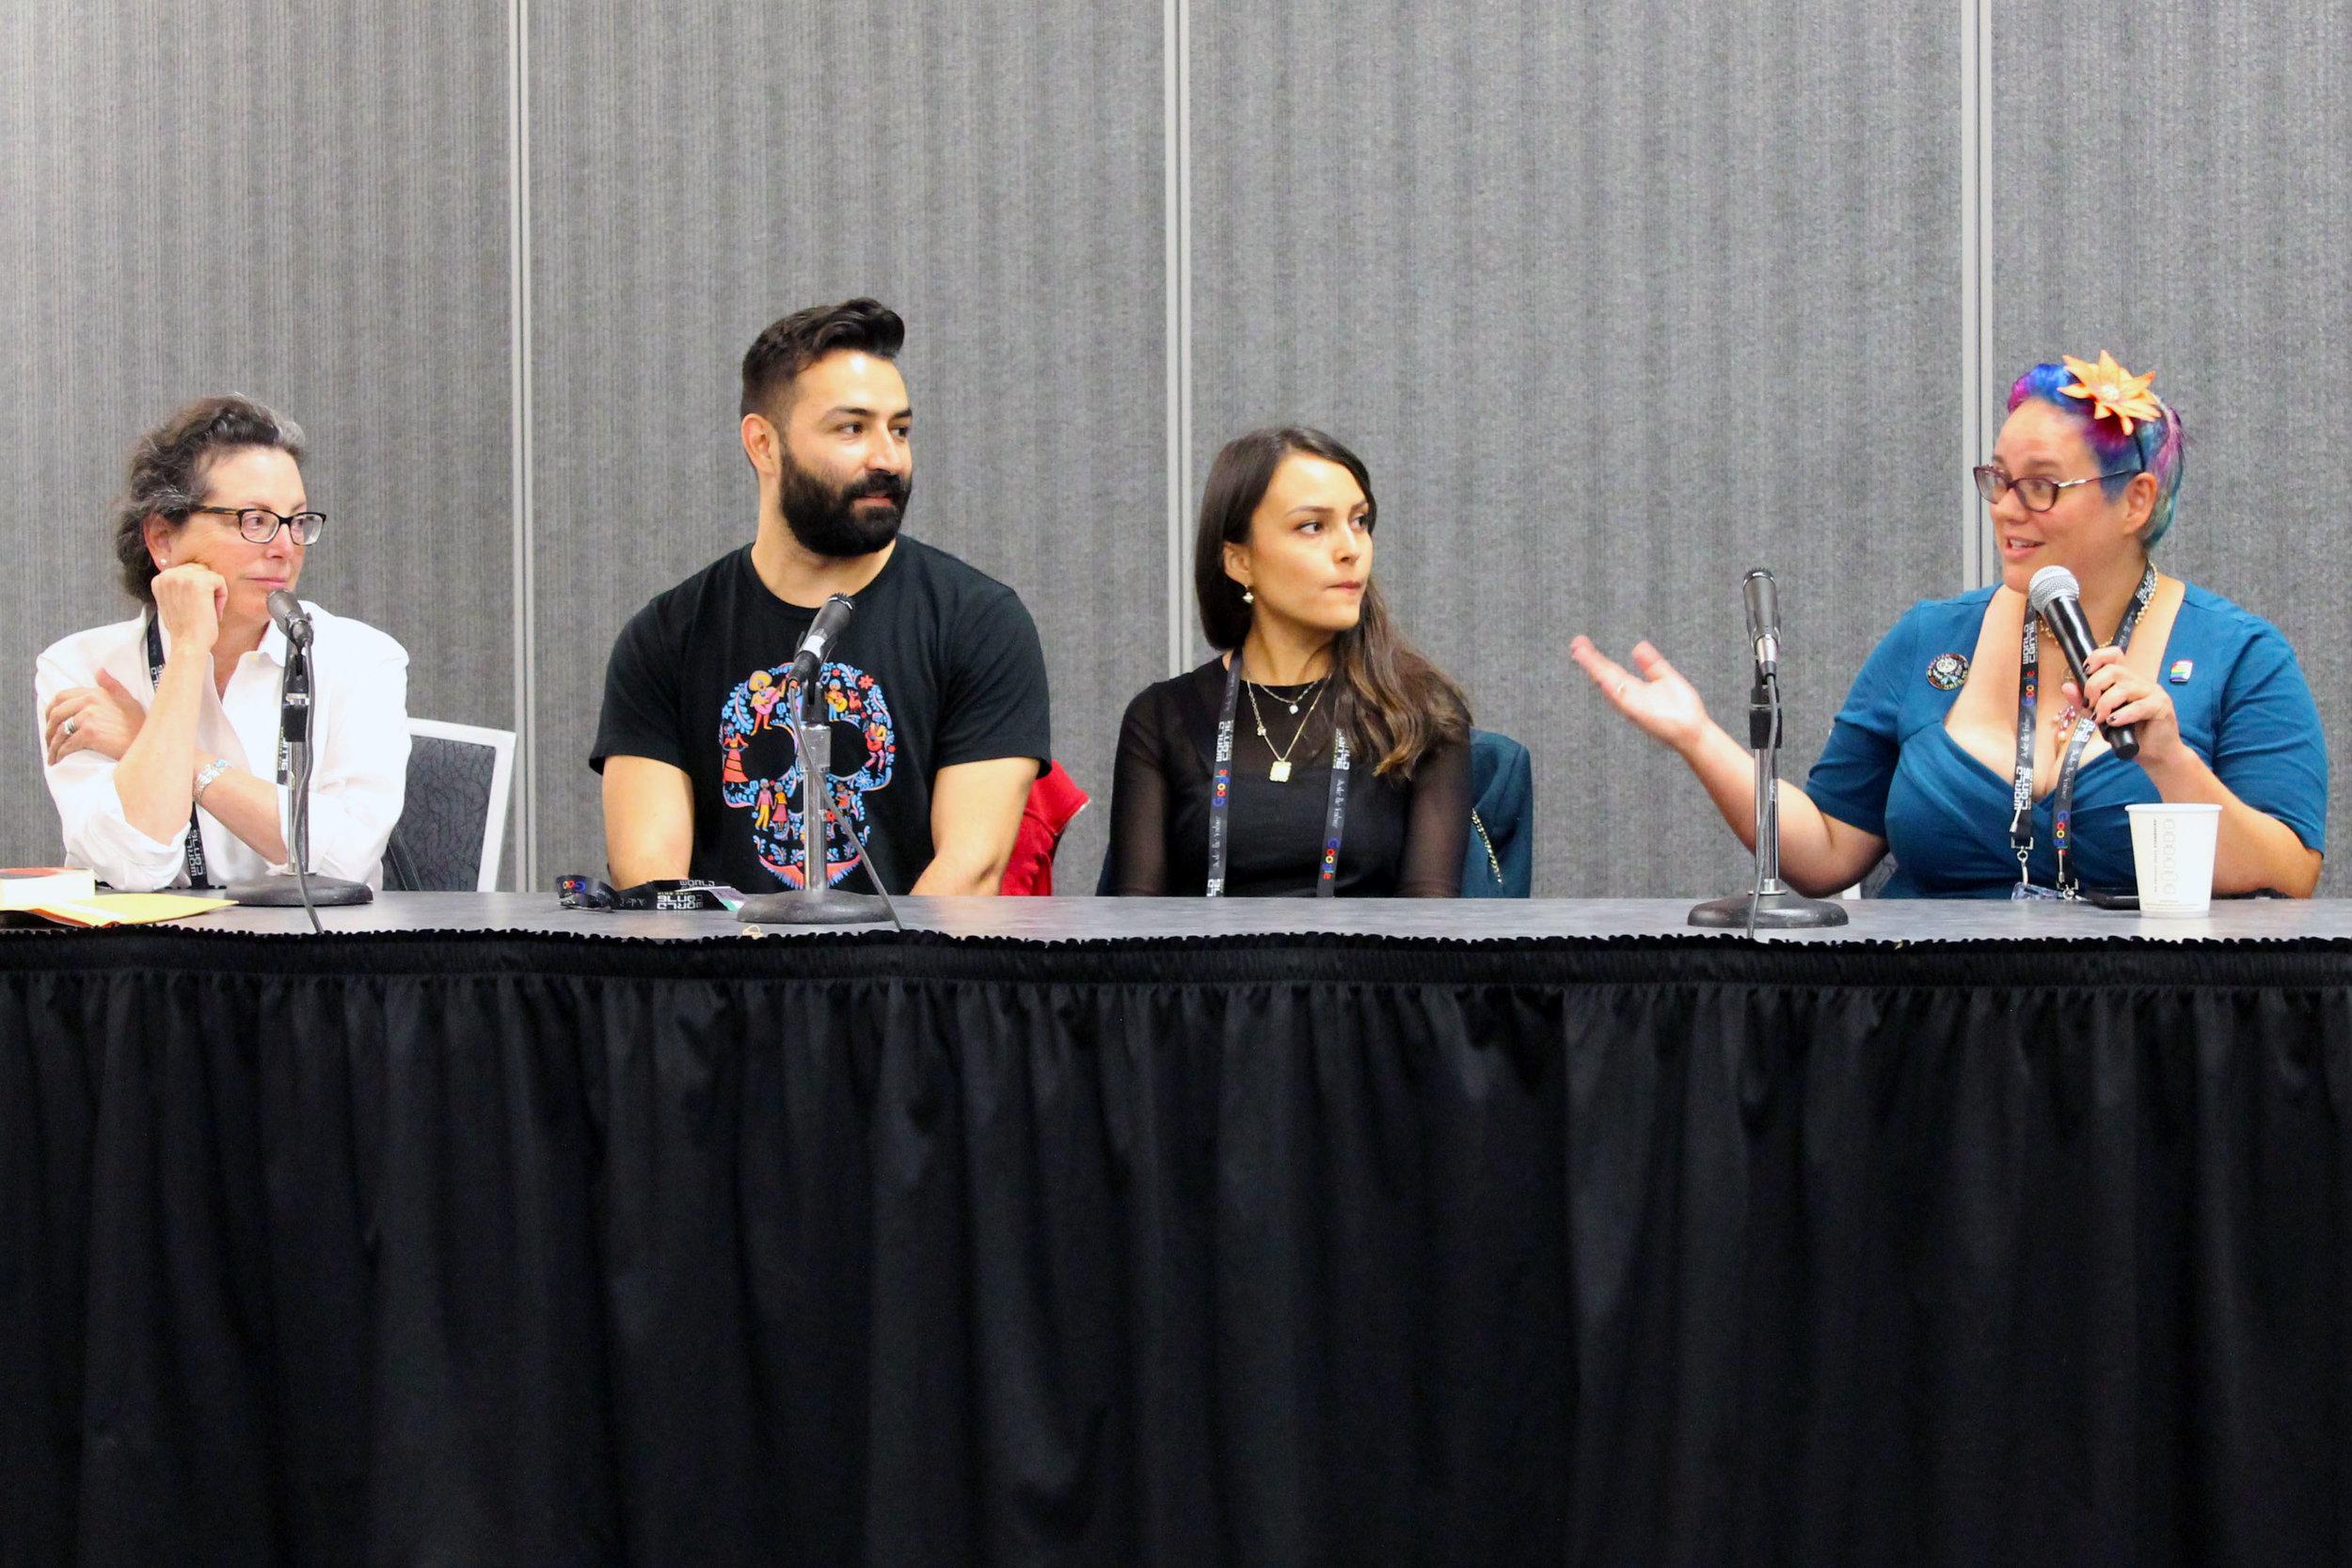 Marcela Davison Avilés, Adrian Molina, Ana Ramirez, and Julia Rios at the Making of Coco panel (Sent by Julia Rios; photo by Kateryna Barnes)